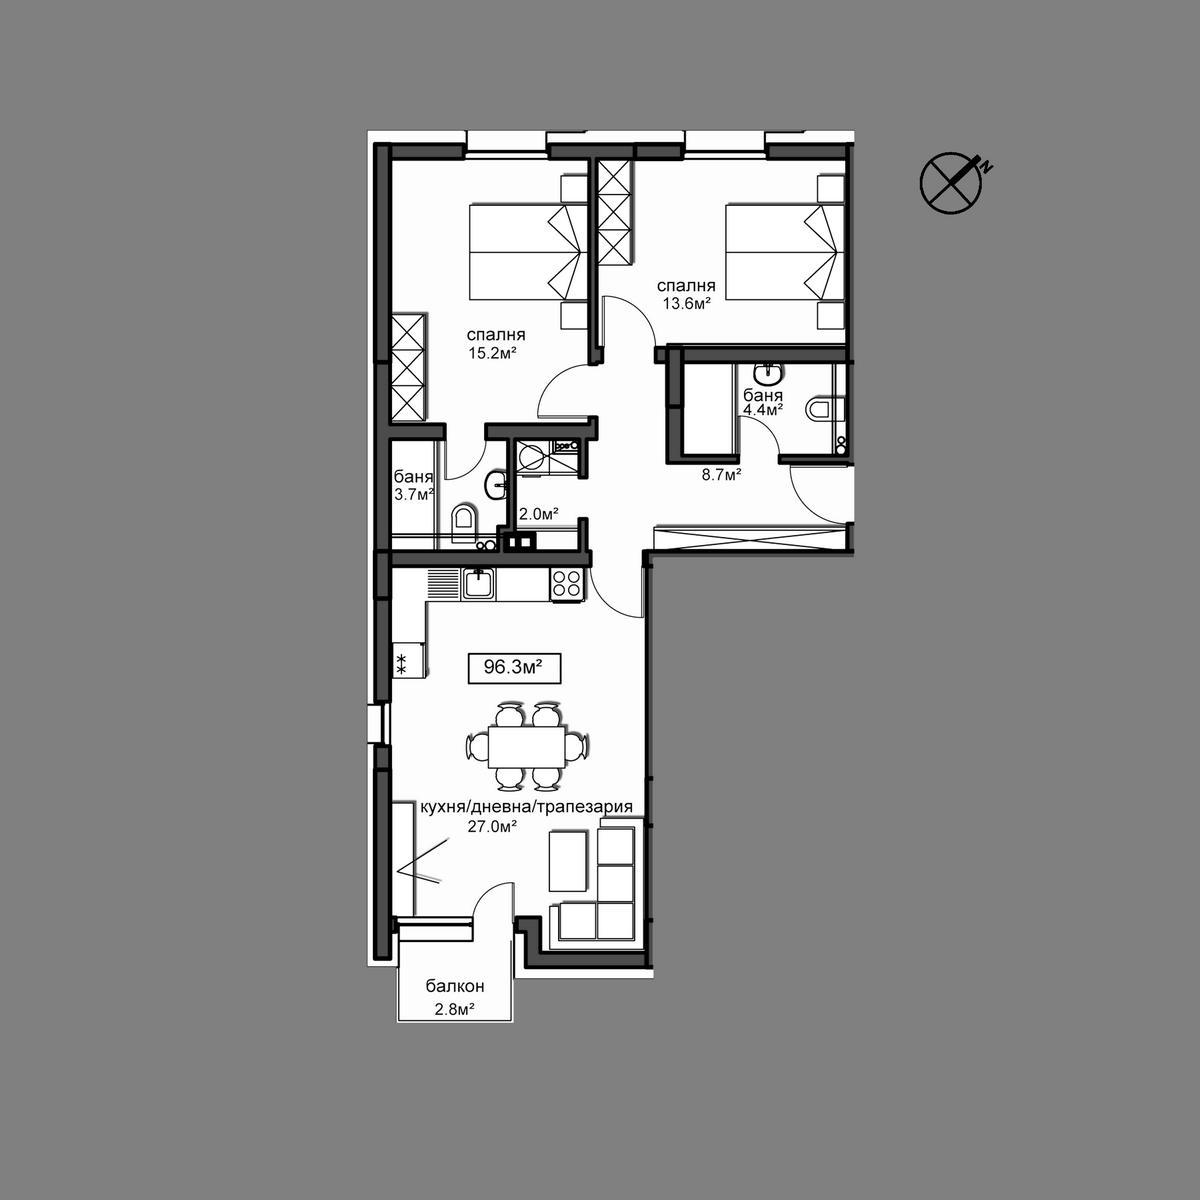 Продава апартамент ново строителство - Апартамент А4